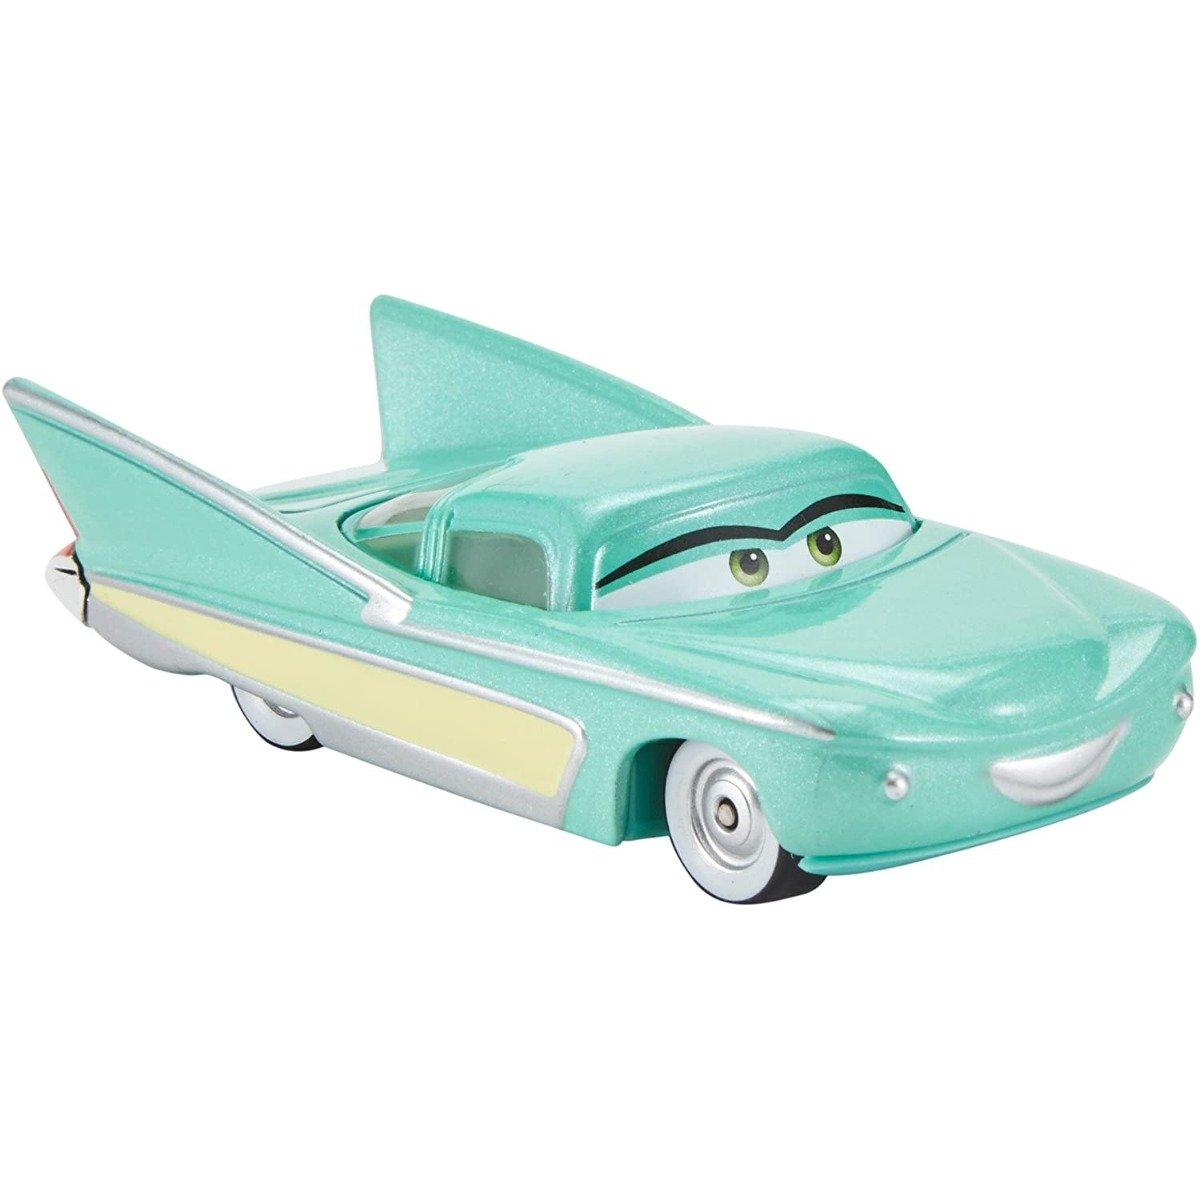 Masina Cars 3 Die Cast, Flo, FJH94